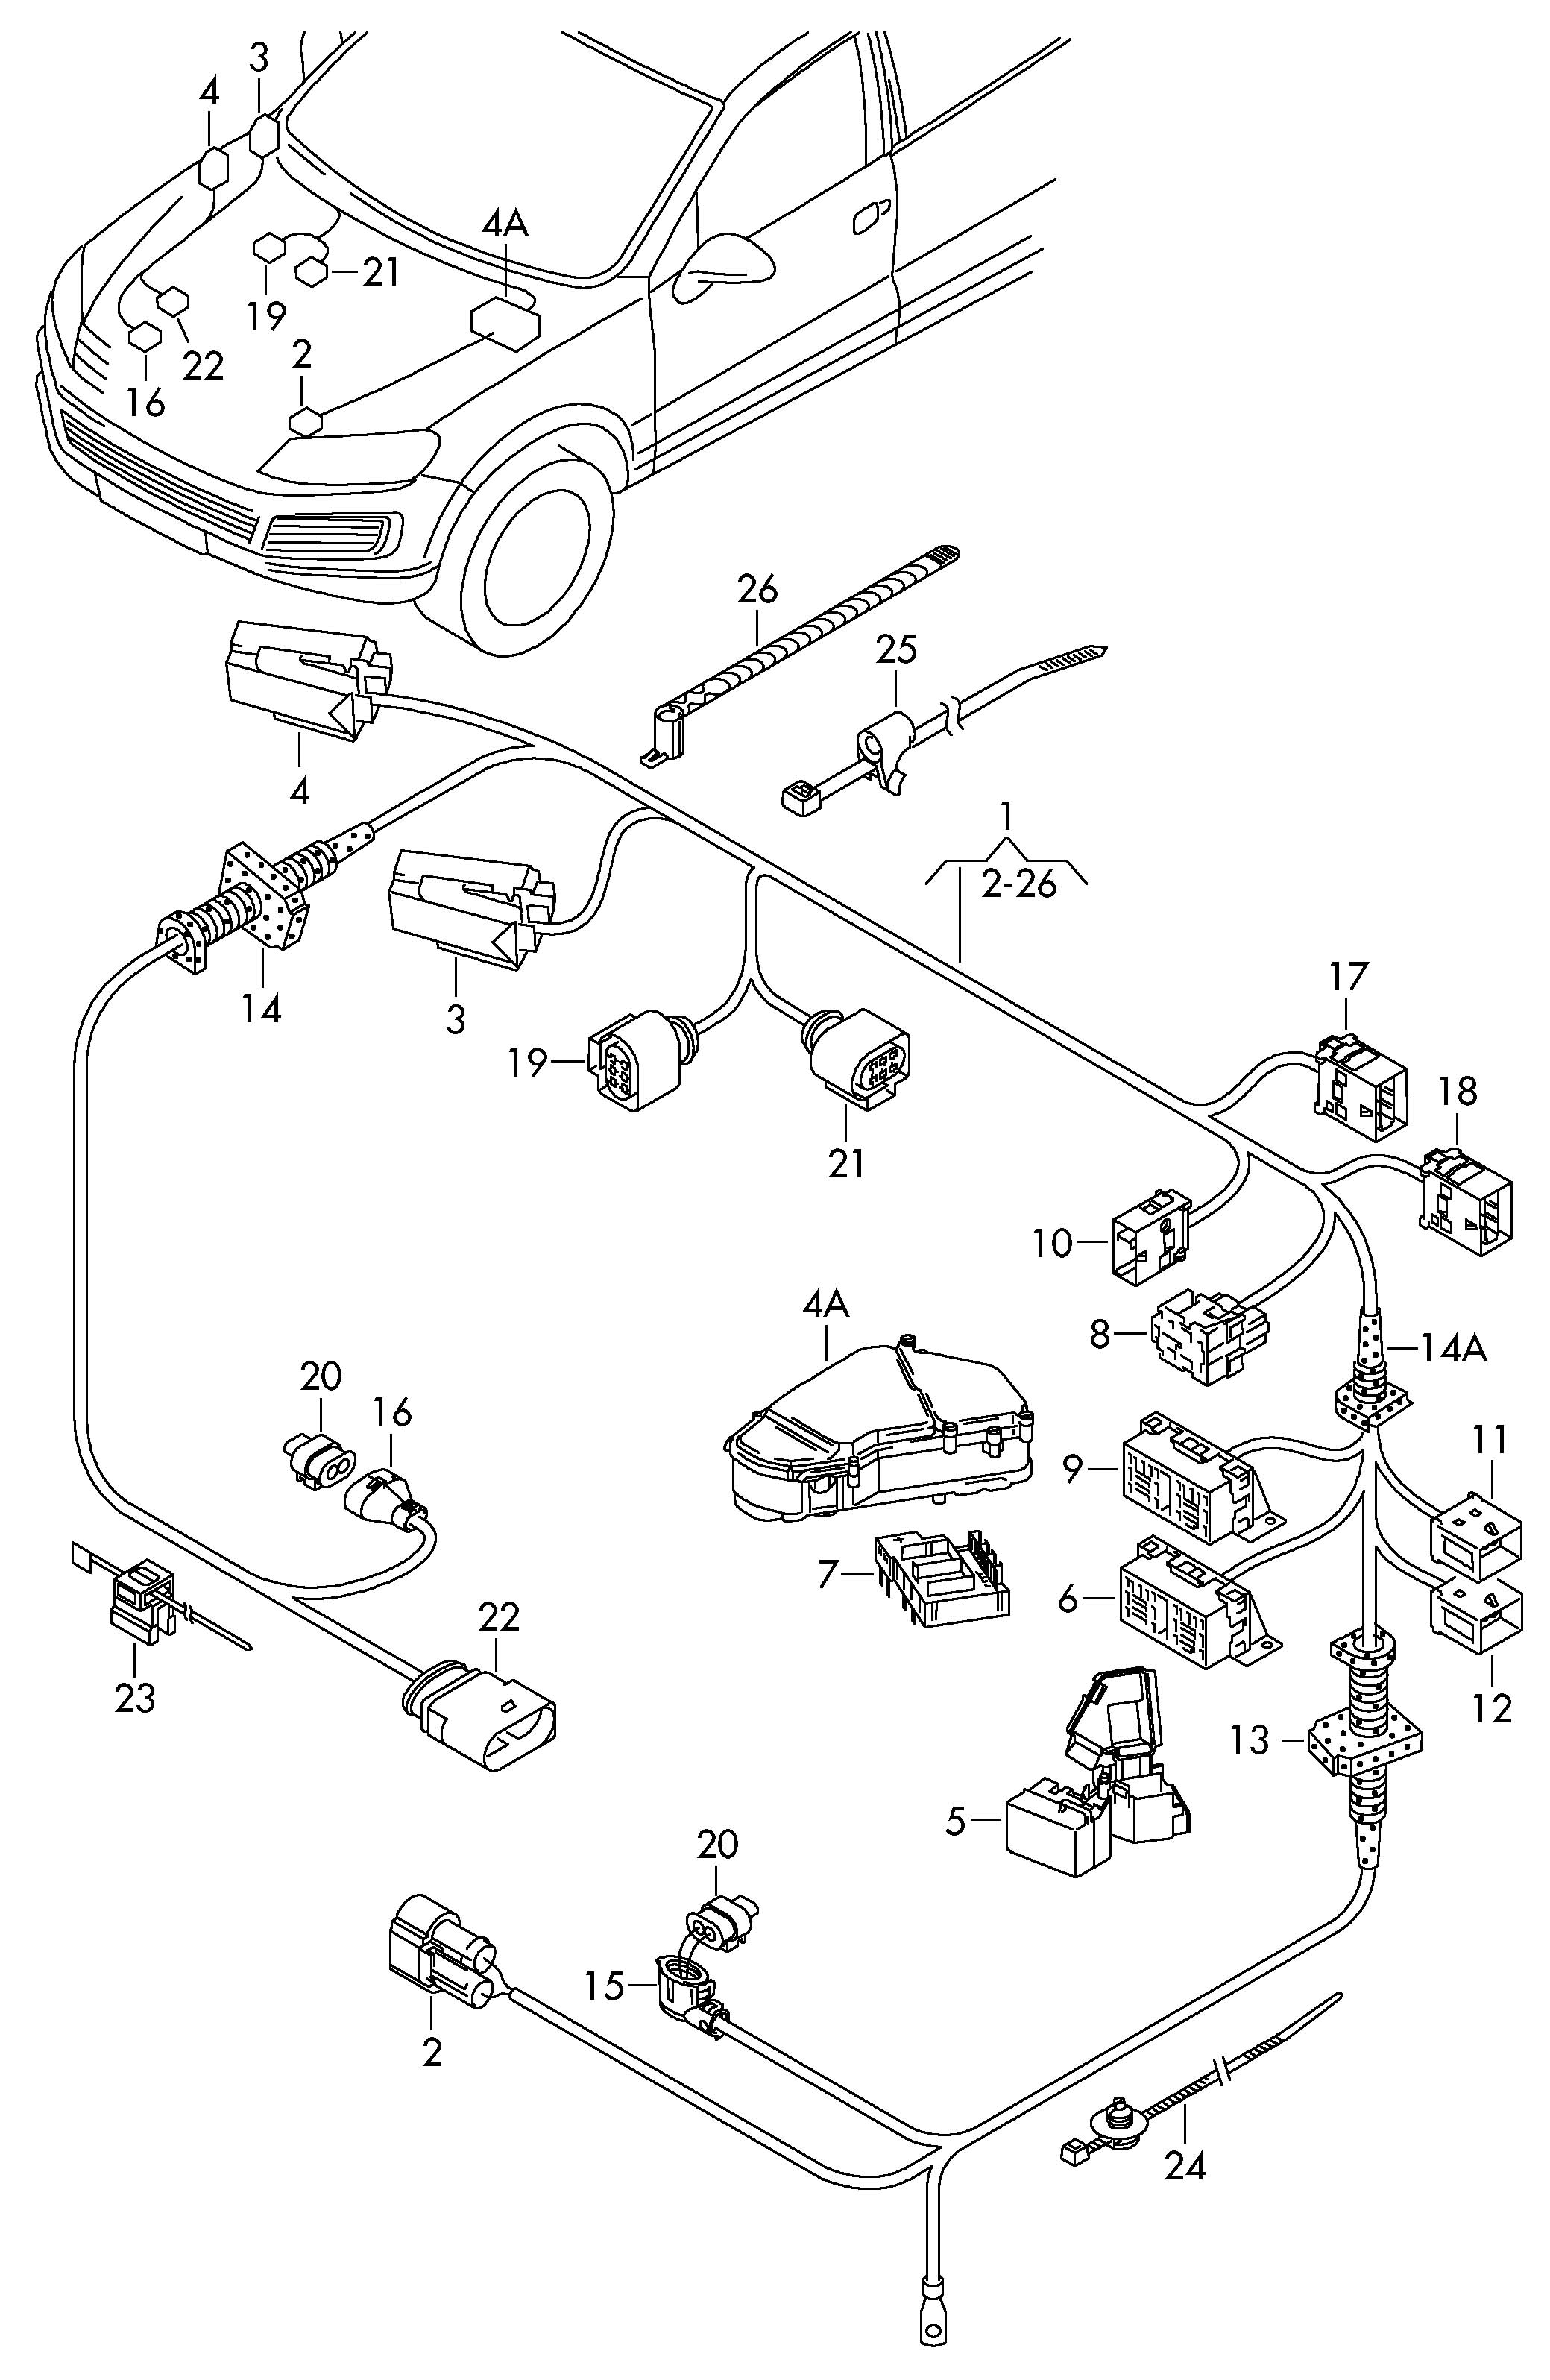 Volkswagen Touareg For Single Wiring Flat Contact Housing